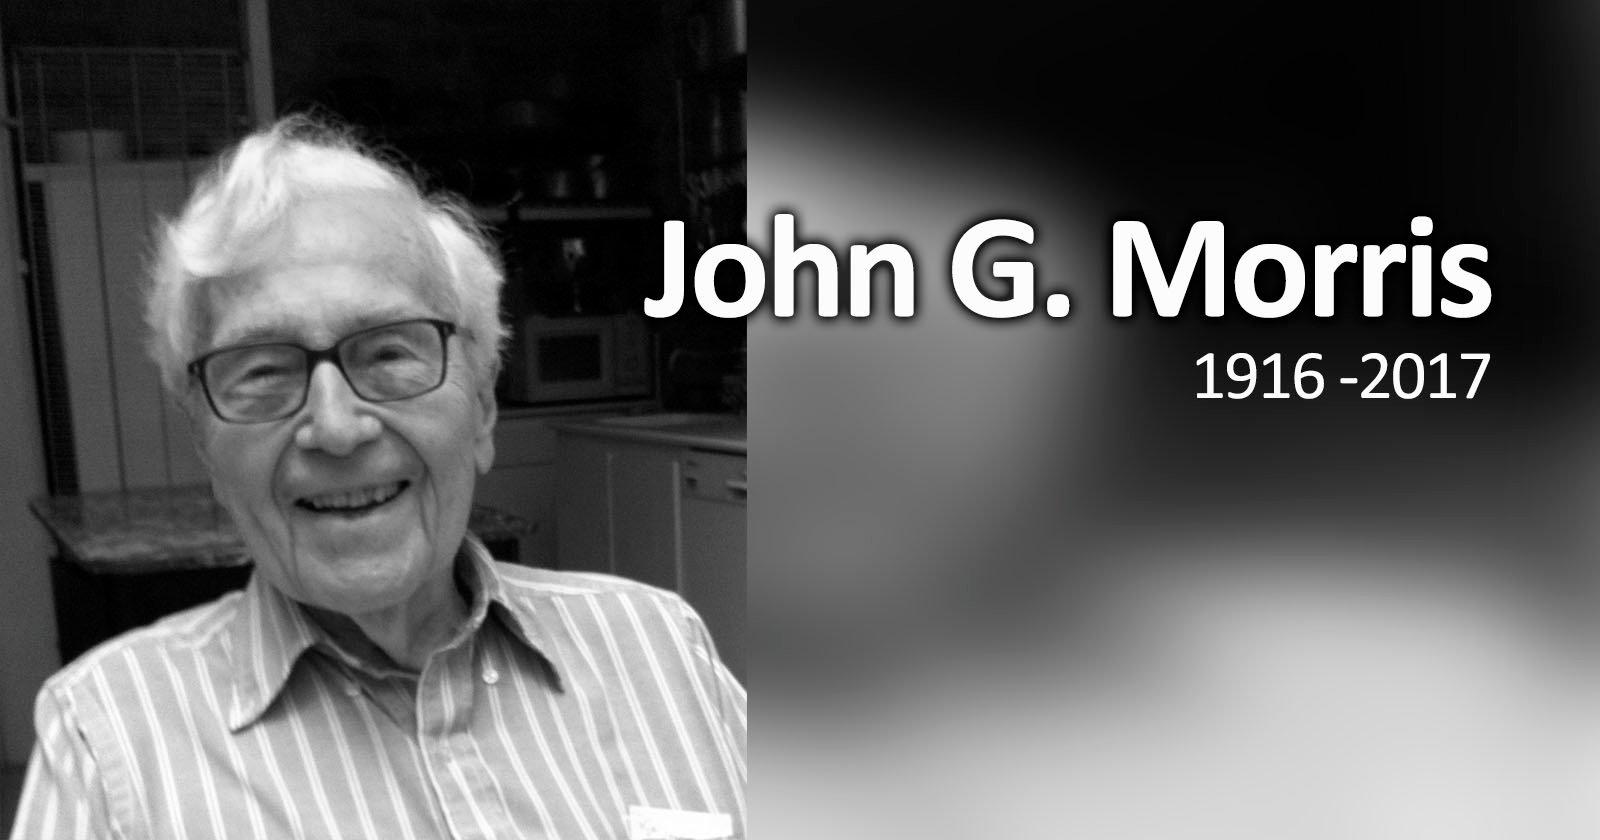 Legendary Photo Editor John G. Morris Dies at 100